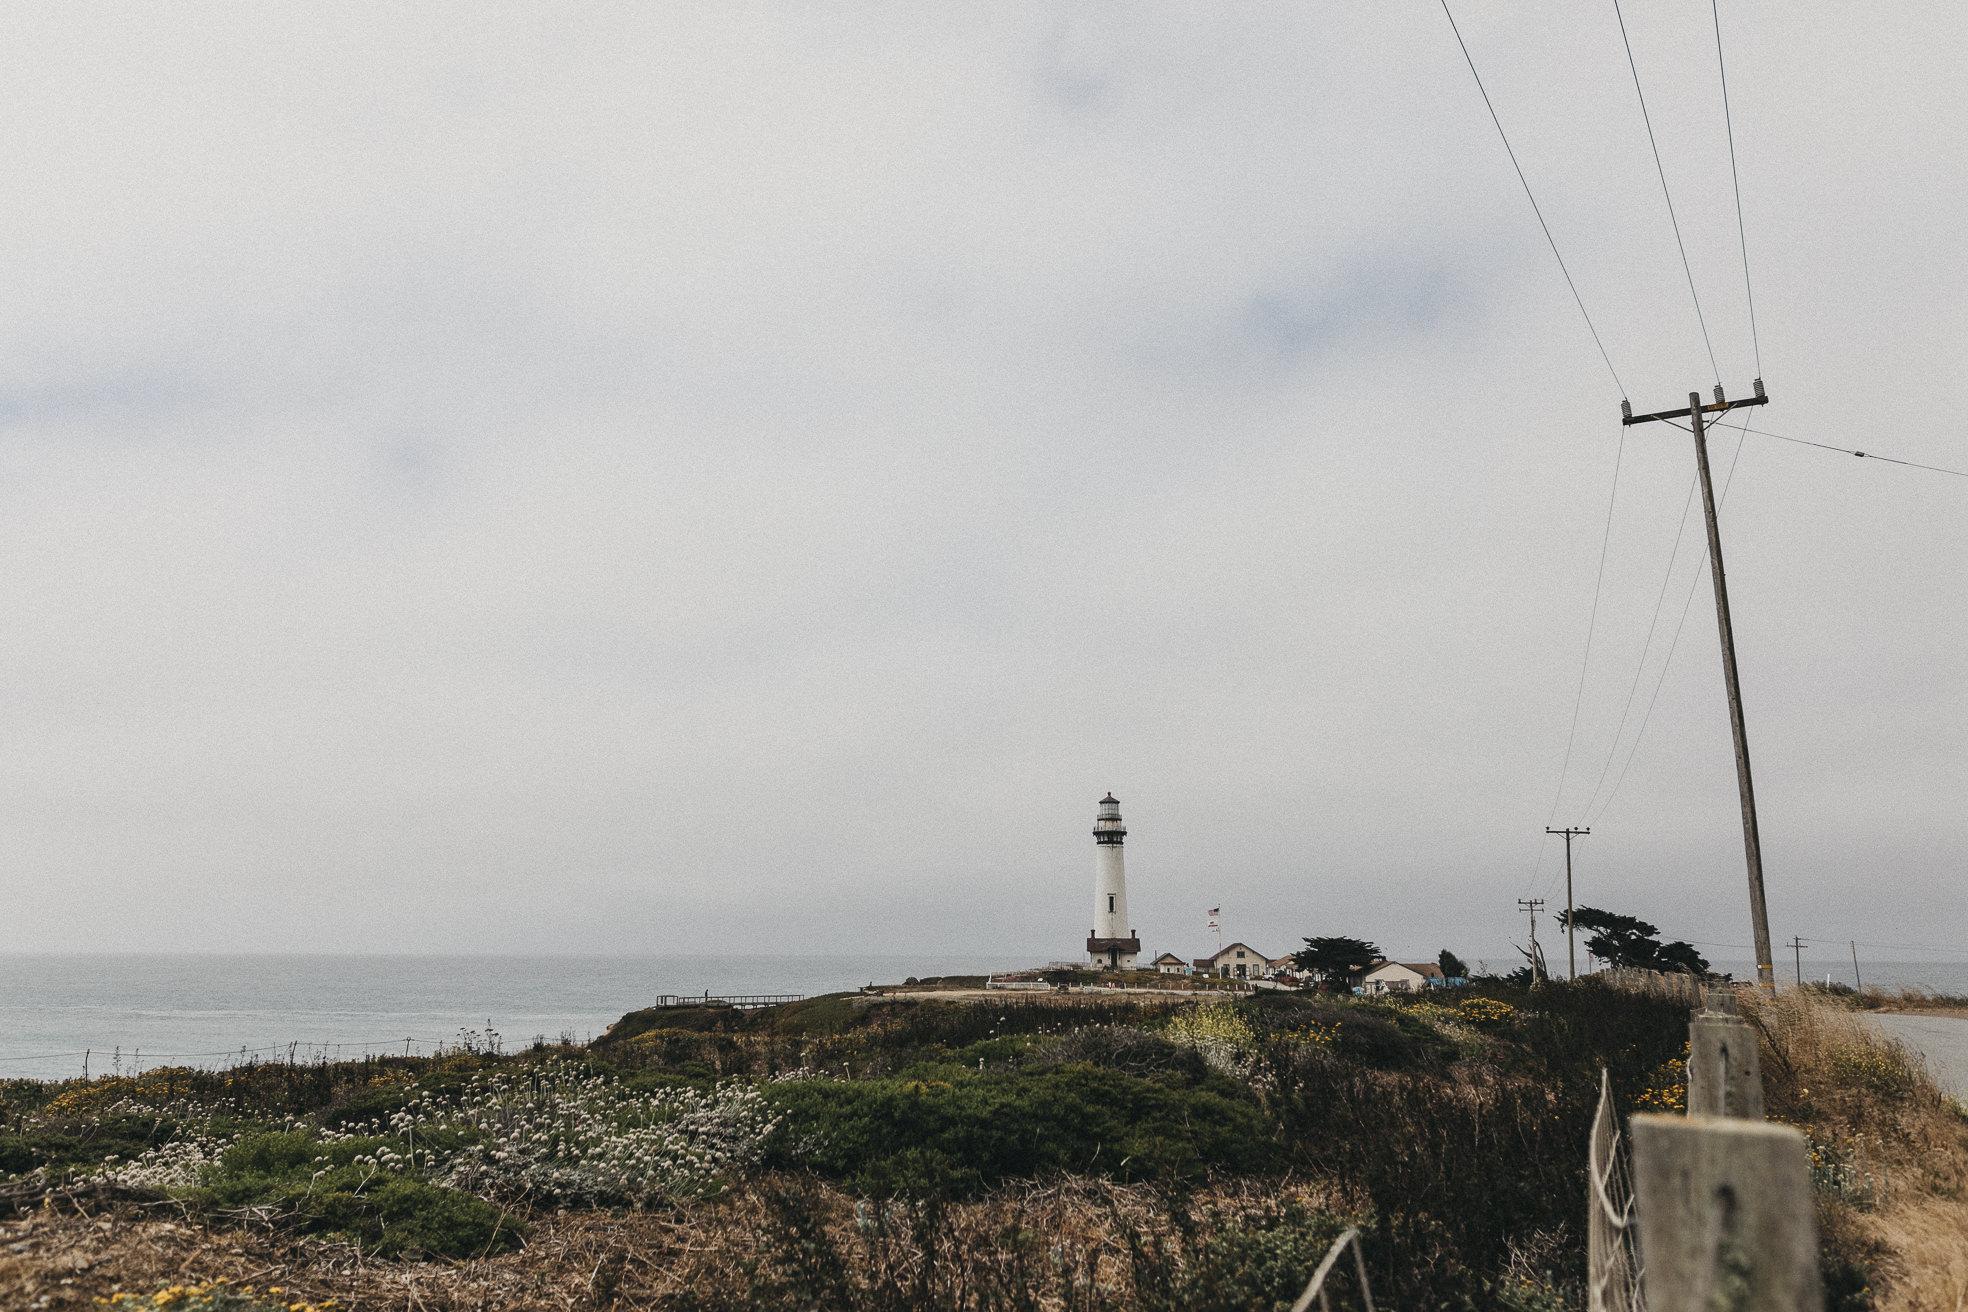 San-Francisco-BildervomLeben-9944